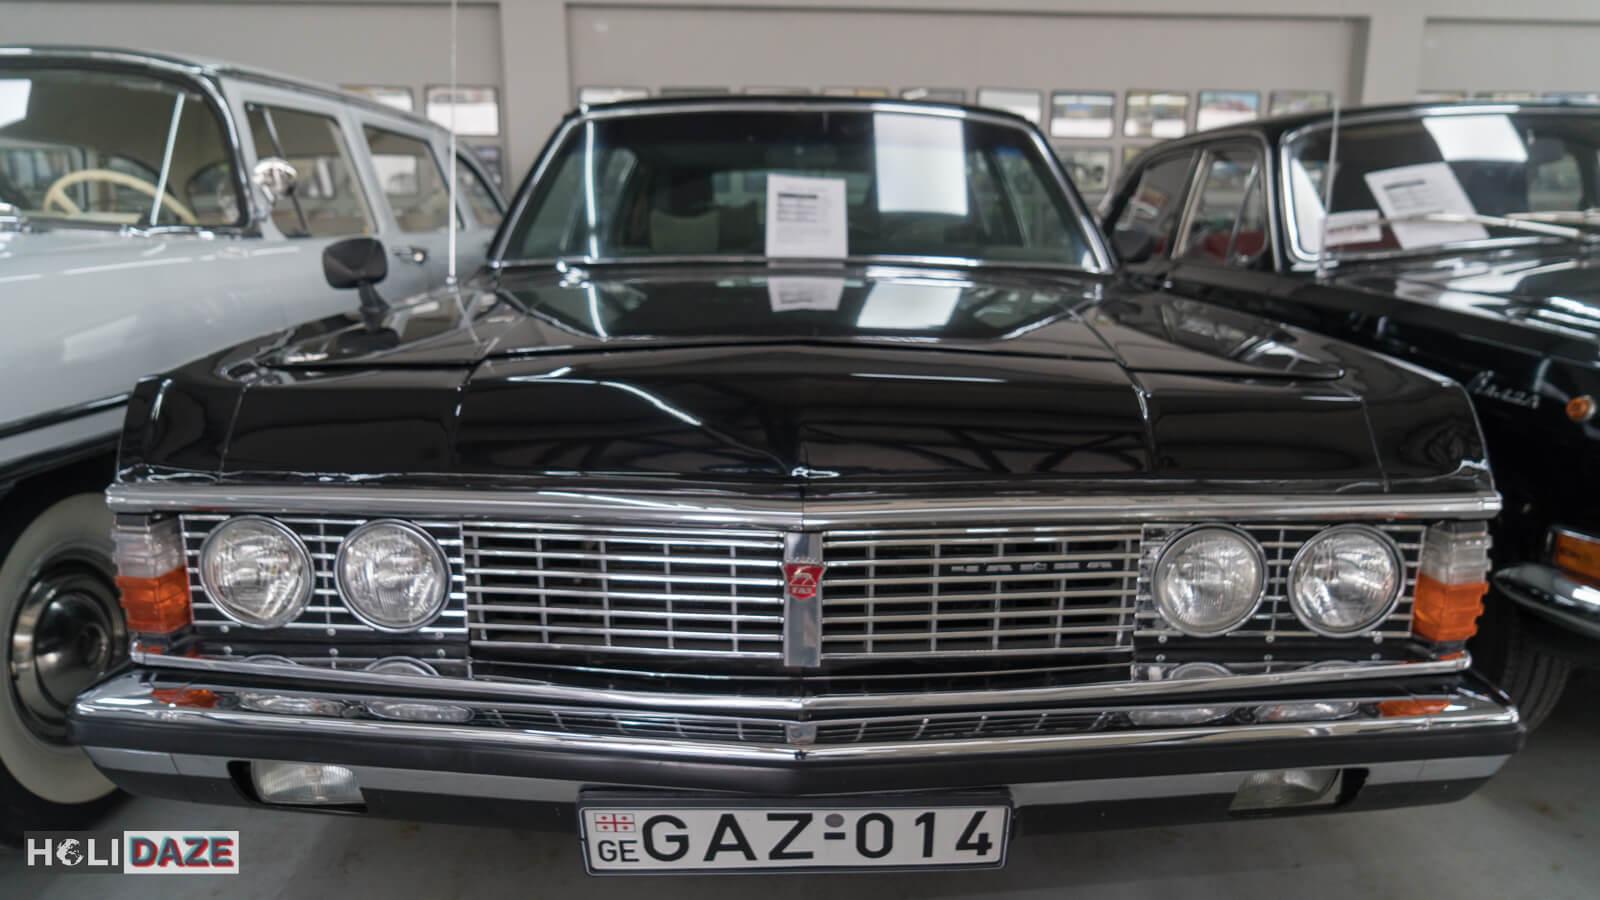 President Eduard Shevardnadze's GAZ-14 is on display at Tbilisi Auto Museum in Georgia